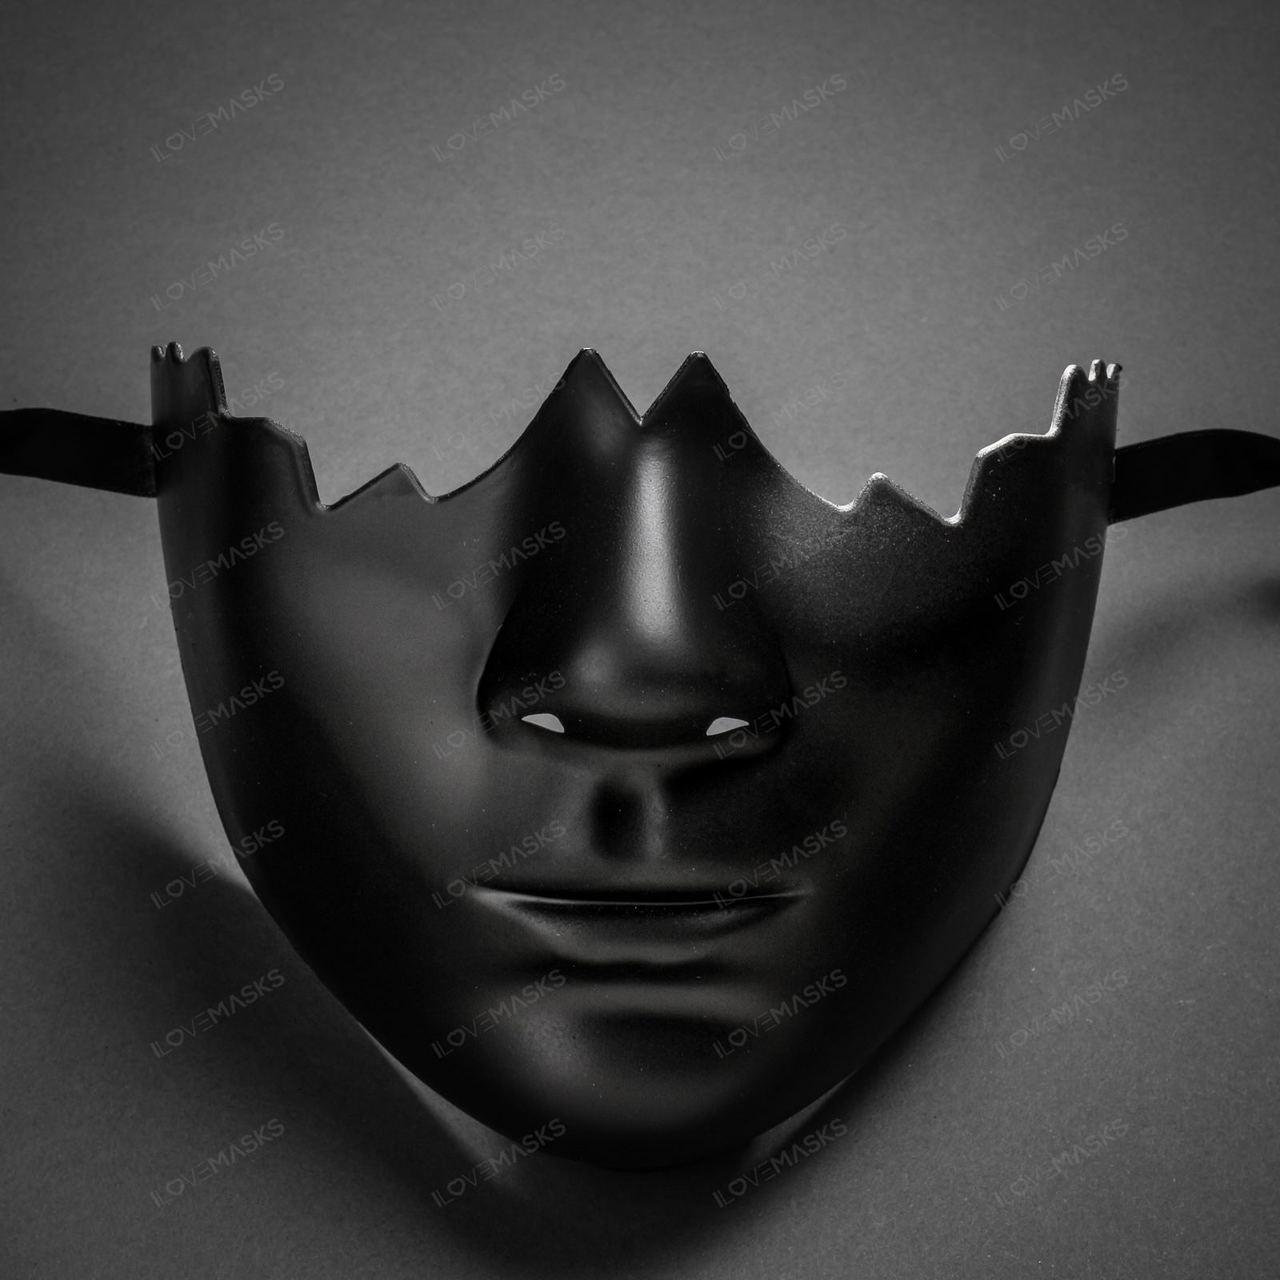 Black Masquerade Half Mask